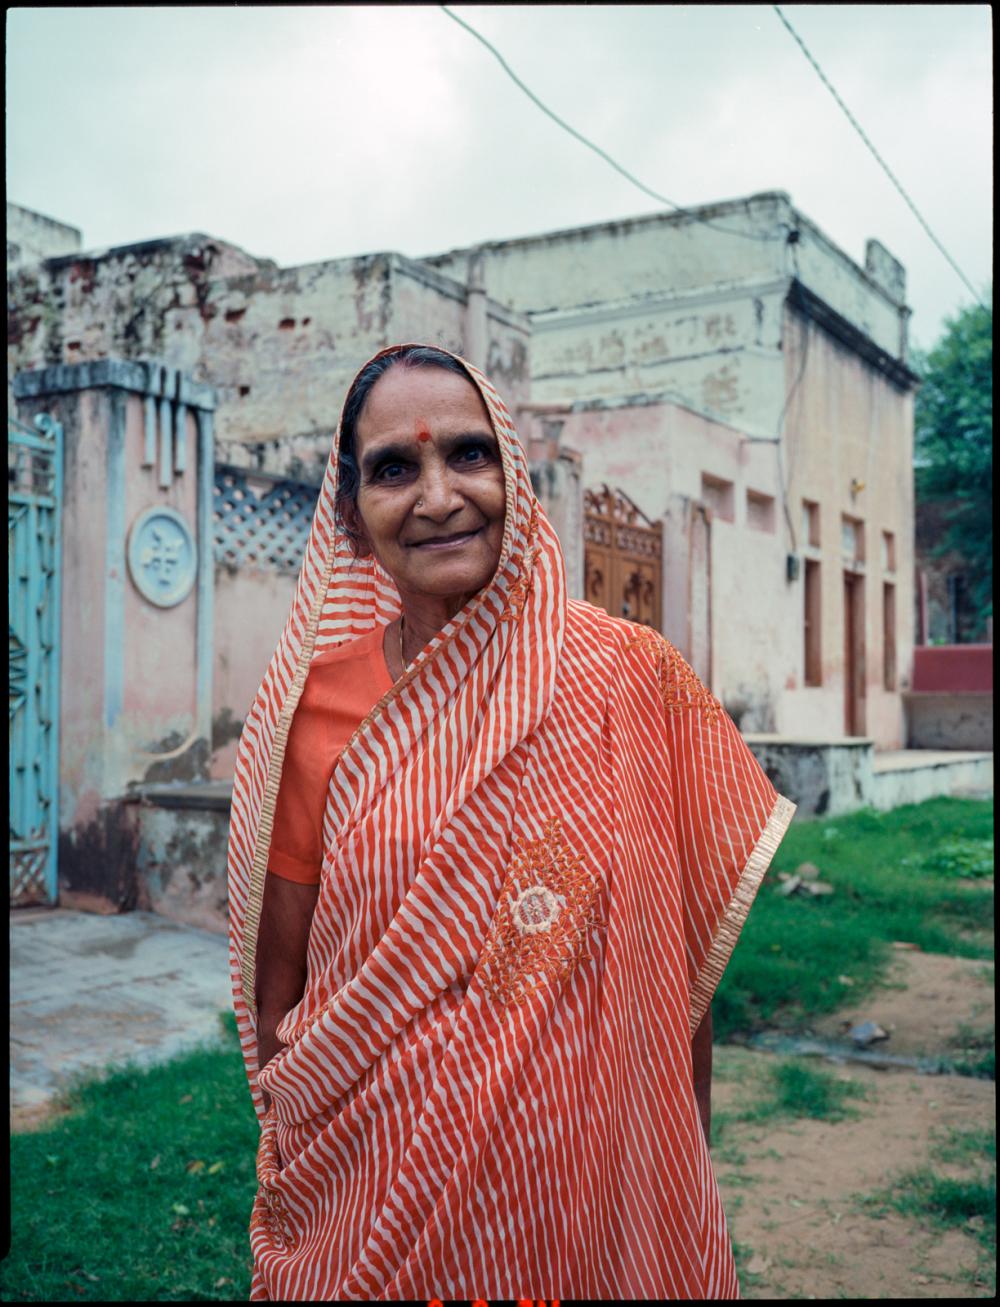 woman in churij ajitgarh, rajasthan, india